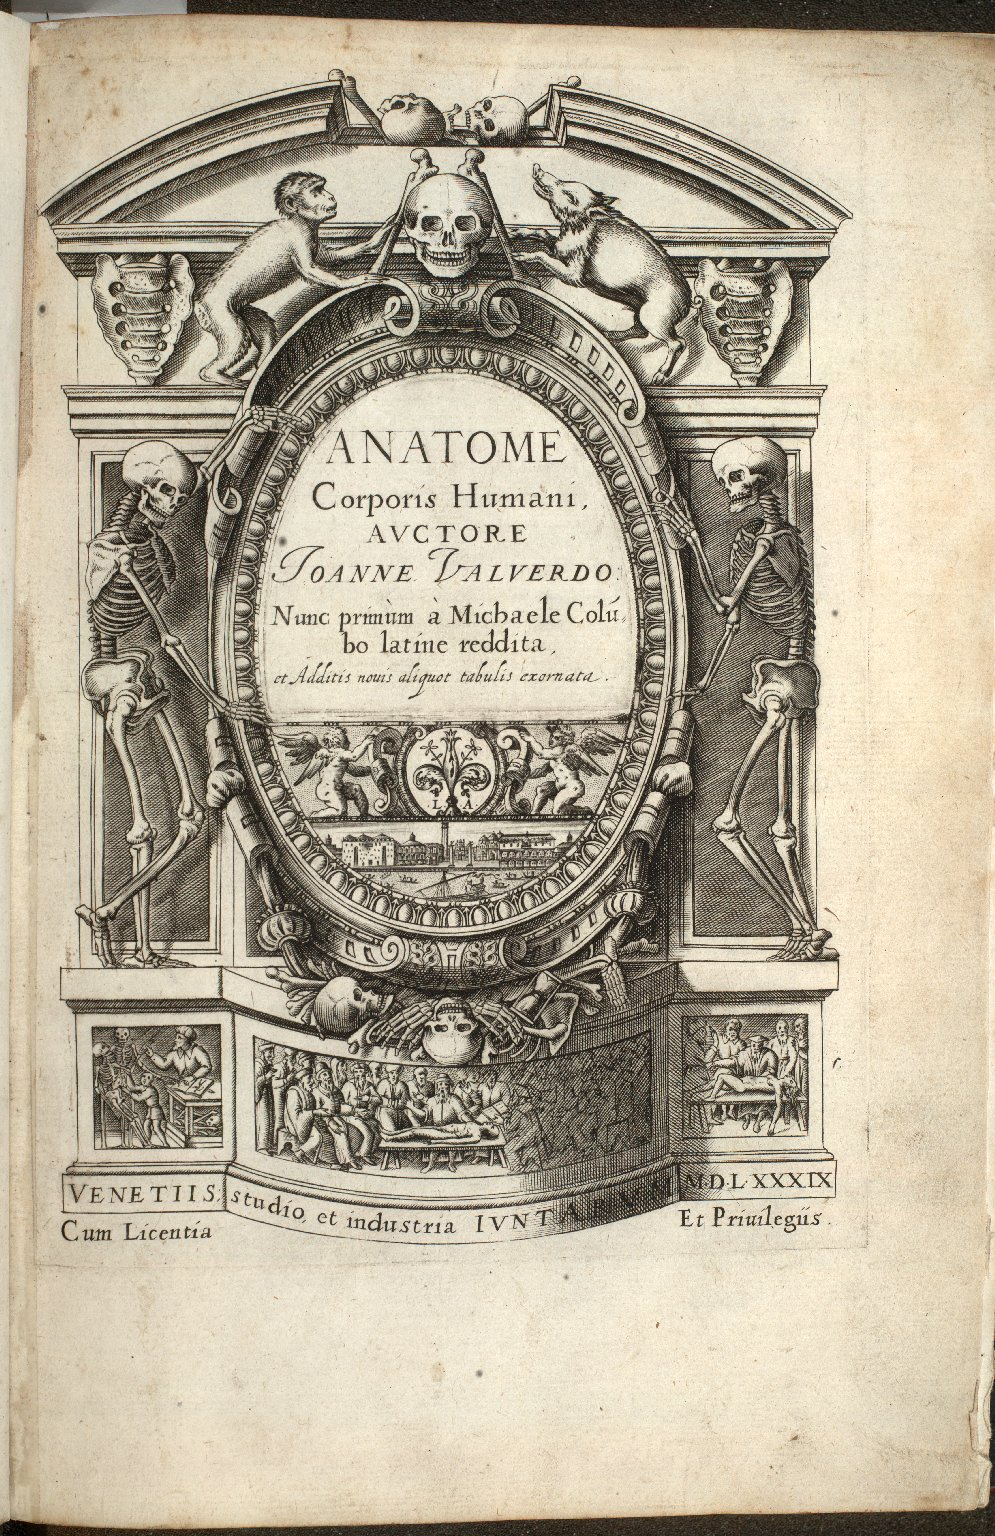 [Title Page of Anatome corporis humani]